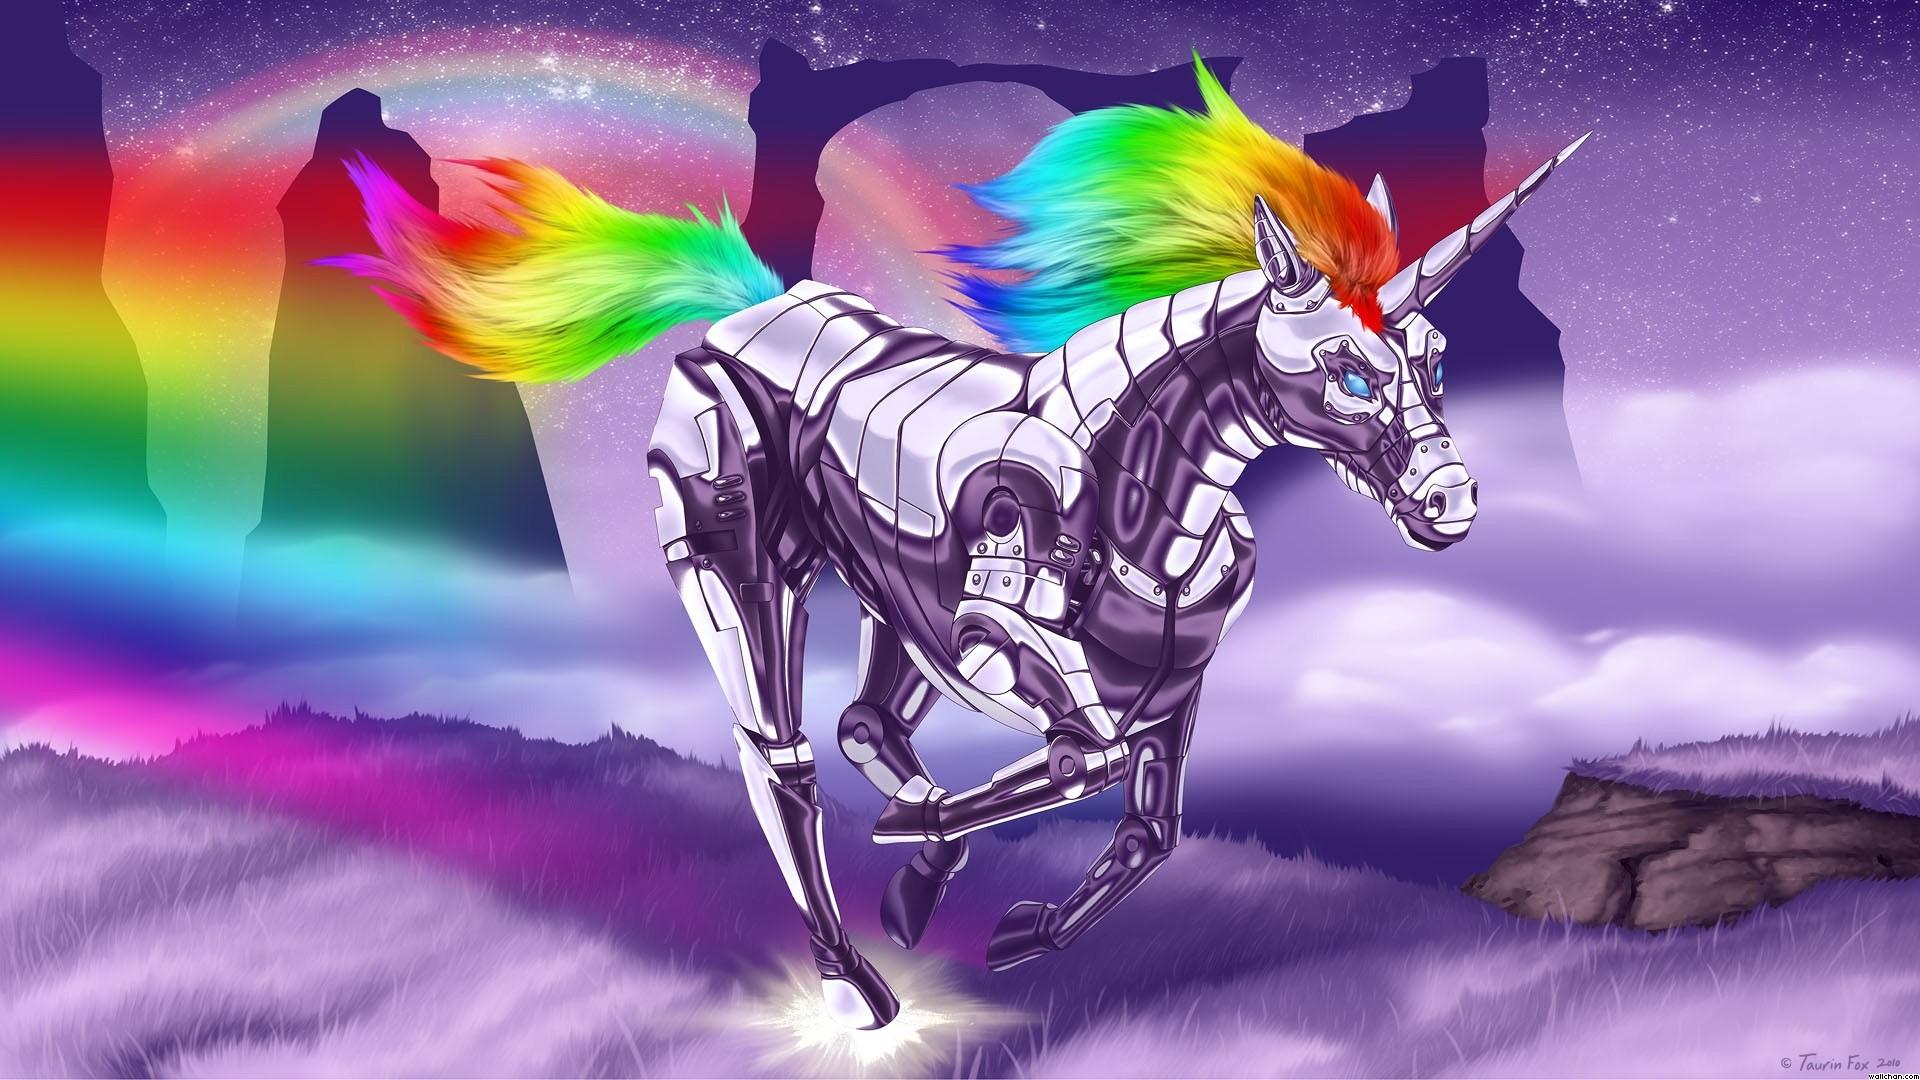 Res: 1920x1080, Robot Unicorn Wallpaper - Unicorns Wallpaper (24171150) - Fanpop